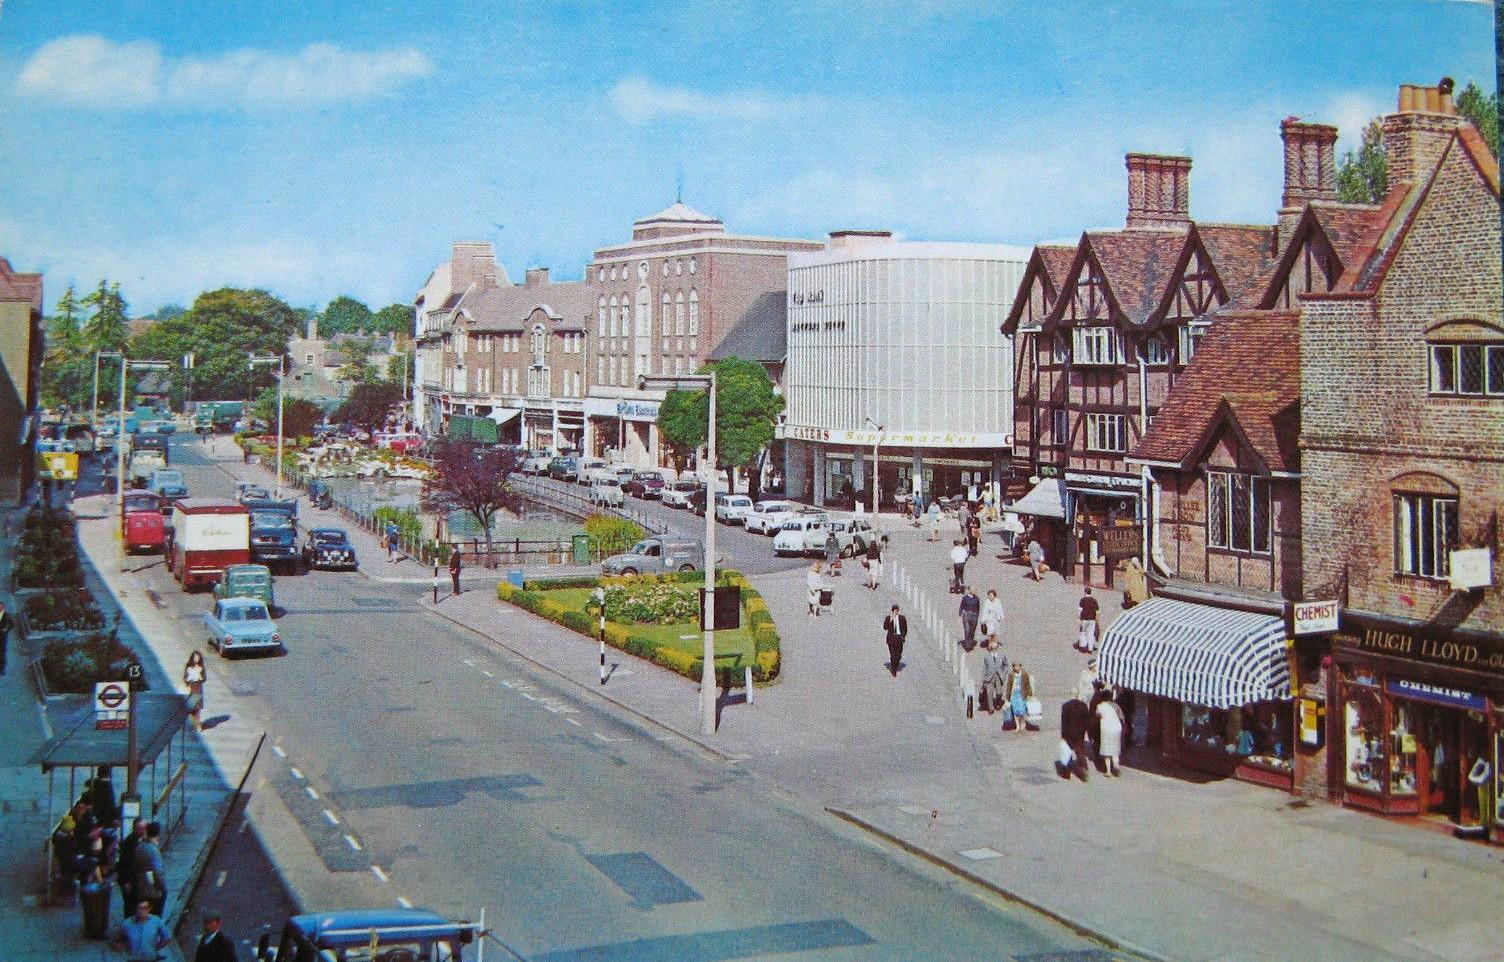 Old Watford High Street